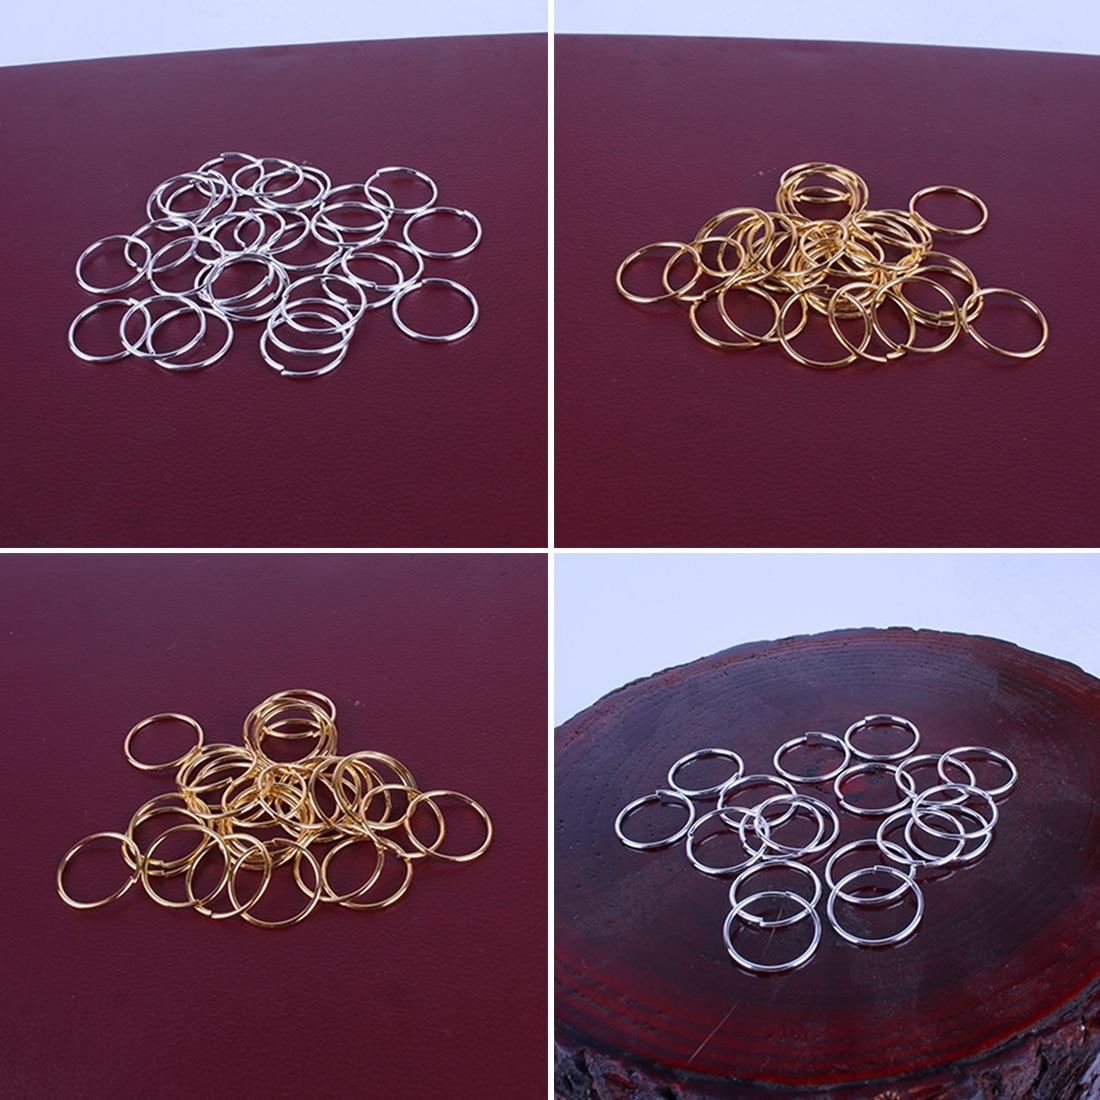 Braided hair gold silver circle hair accessory Dreadlock ring beads long hair clip braided beads beads adjustable hairpin braid